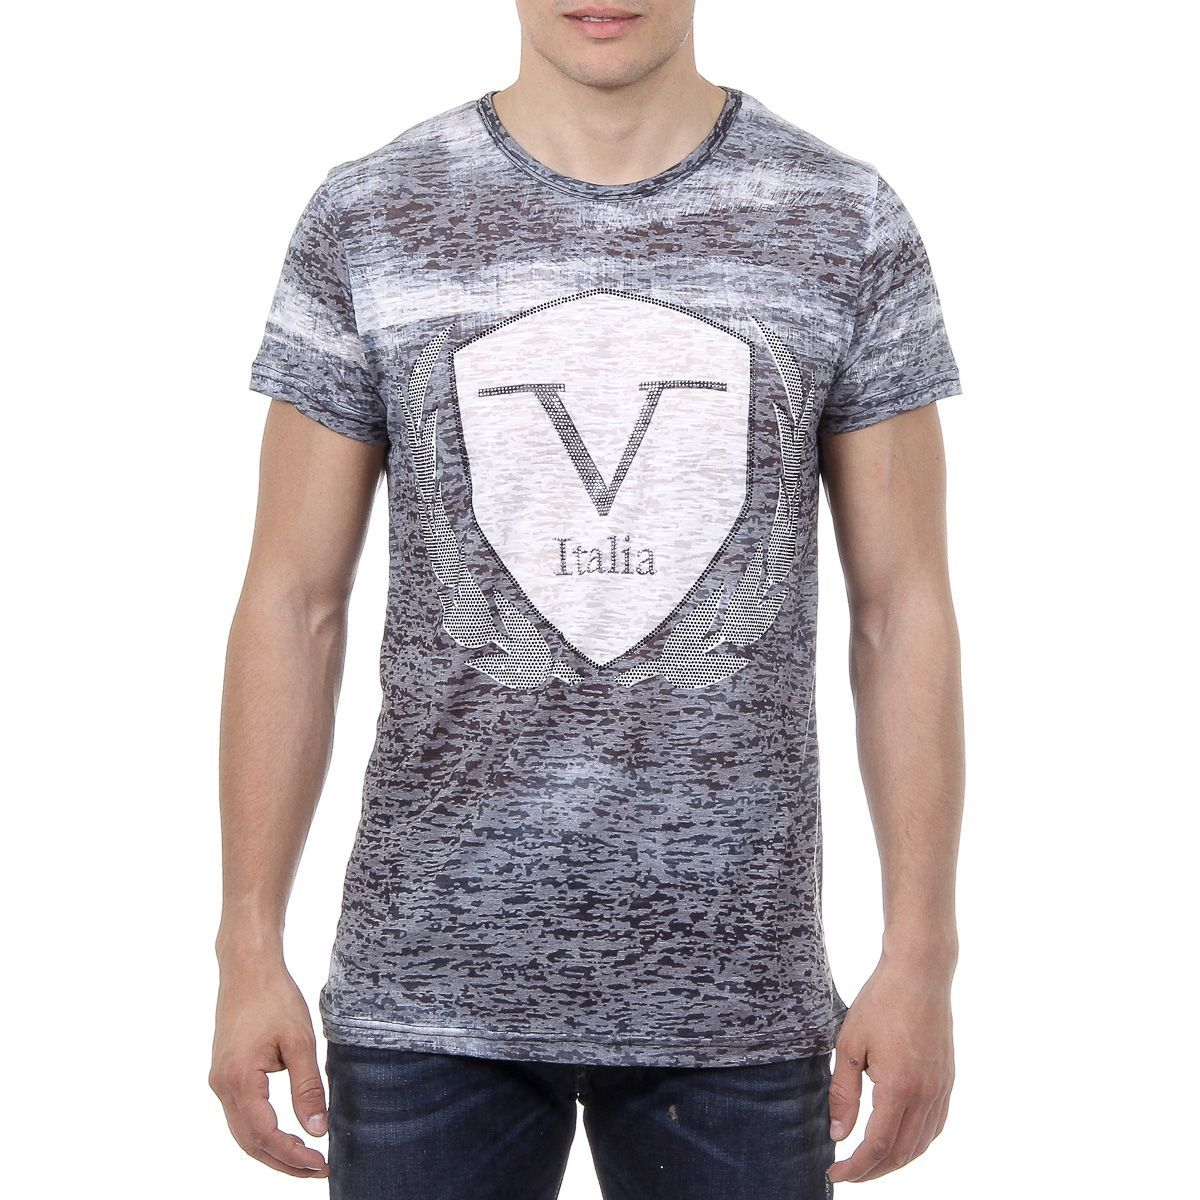 Versace italia mens tshirt short sleeves round neck black logan